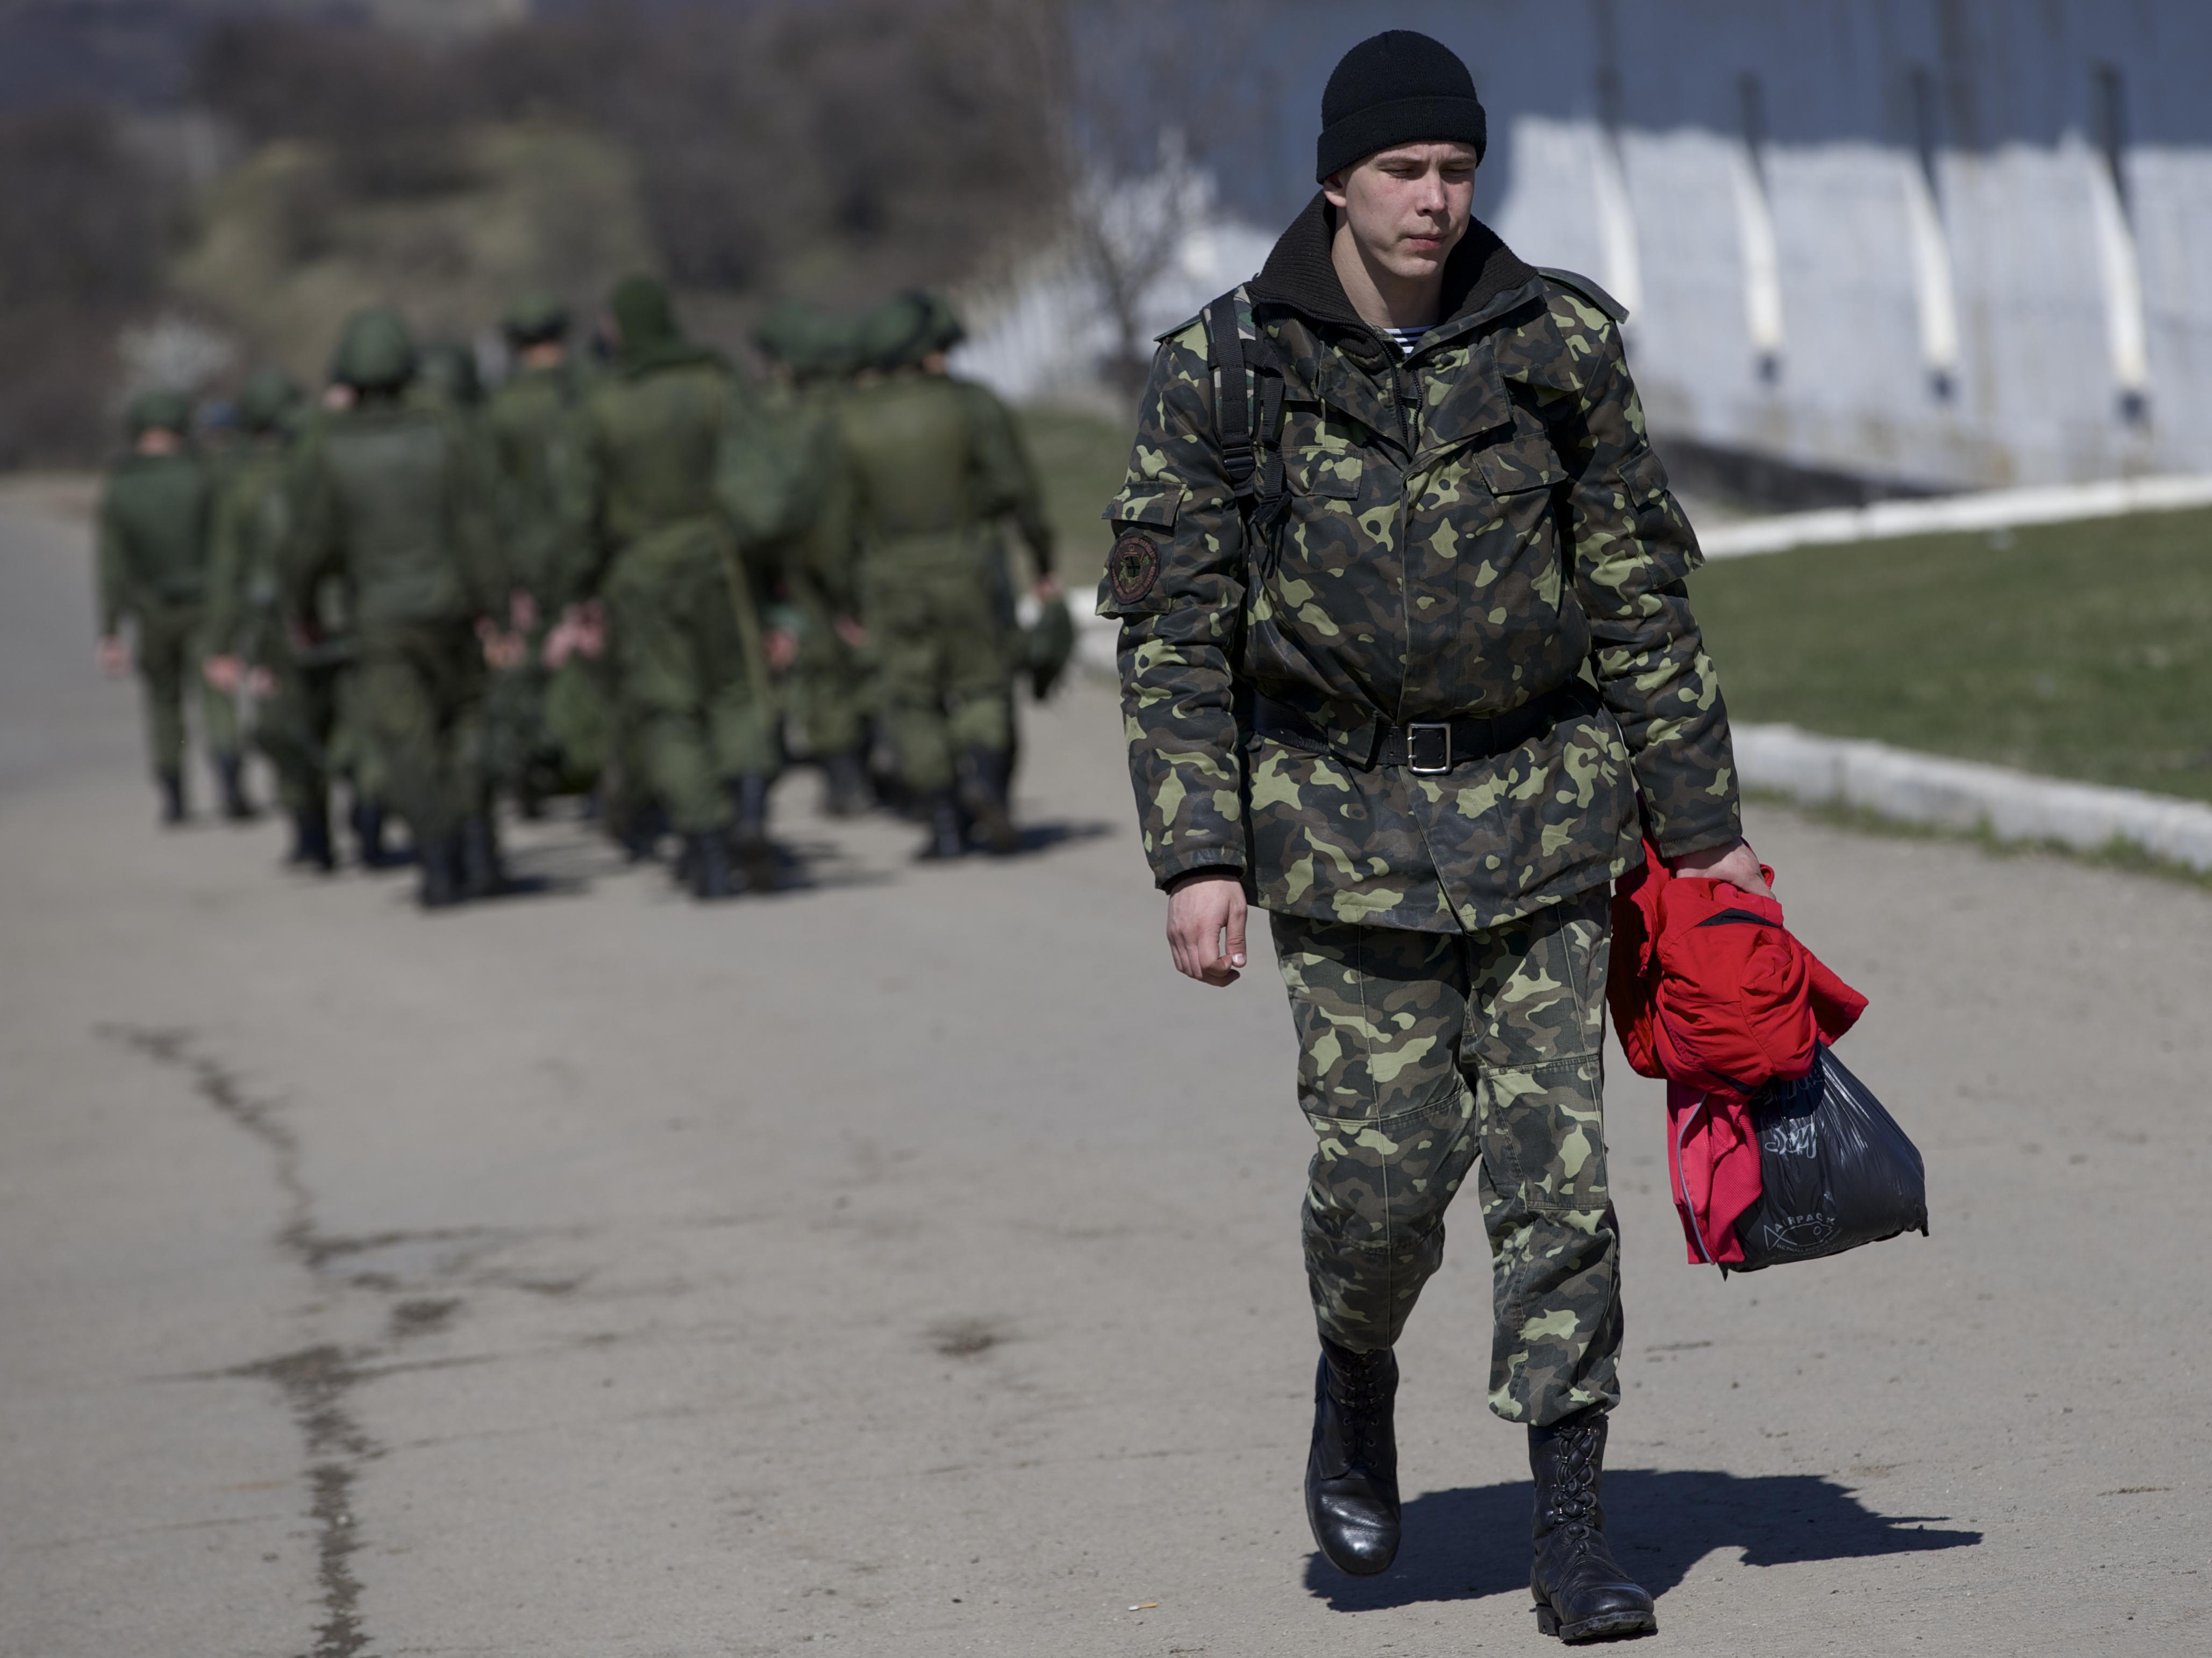 Split Decisions: Ukraine Signs Up With EU, Russia Wraps Up Crimea